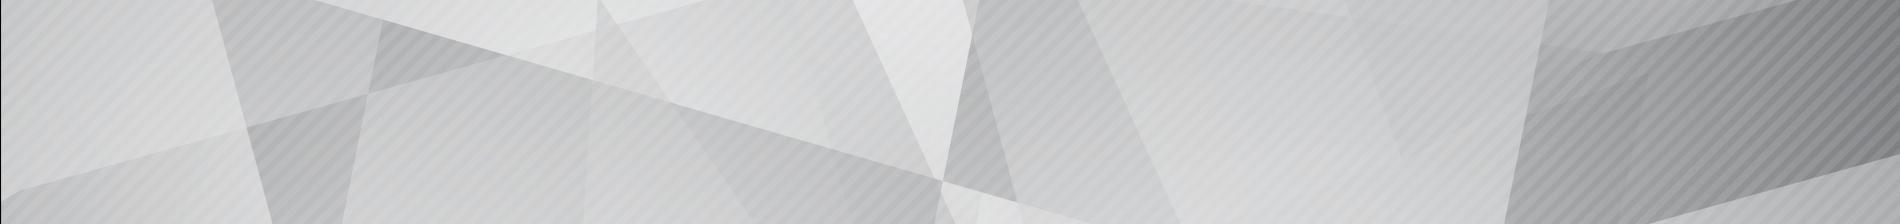 SMART NIGHT RUNNING MORUMBI 2018 - 2ª ETAPA - Imagem de topo